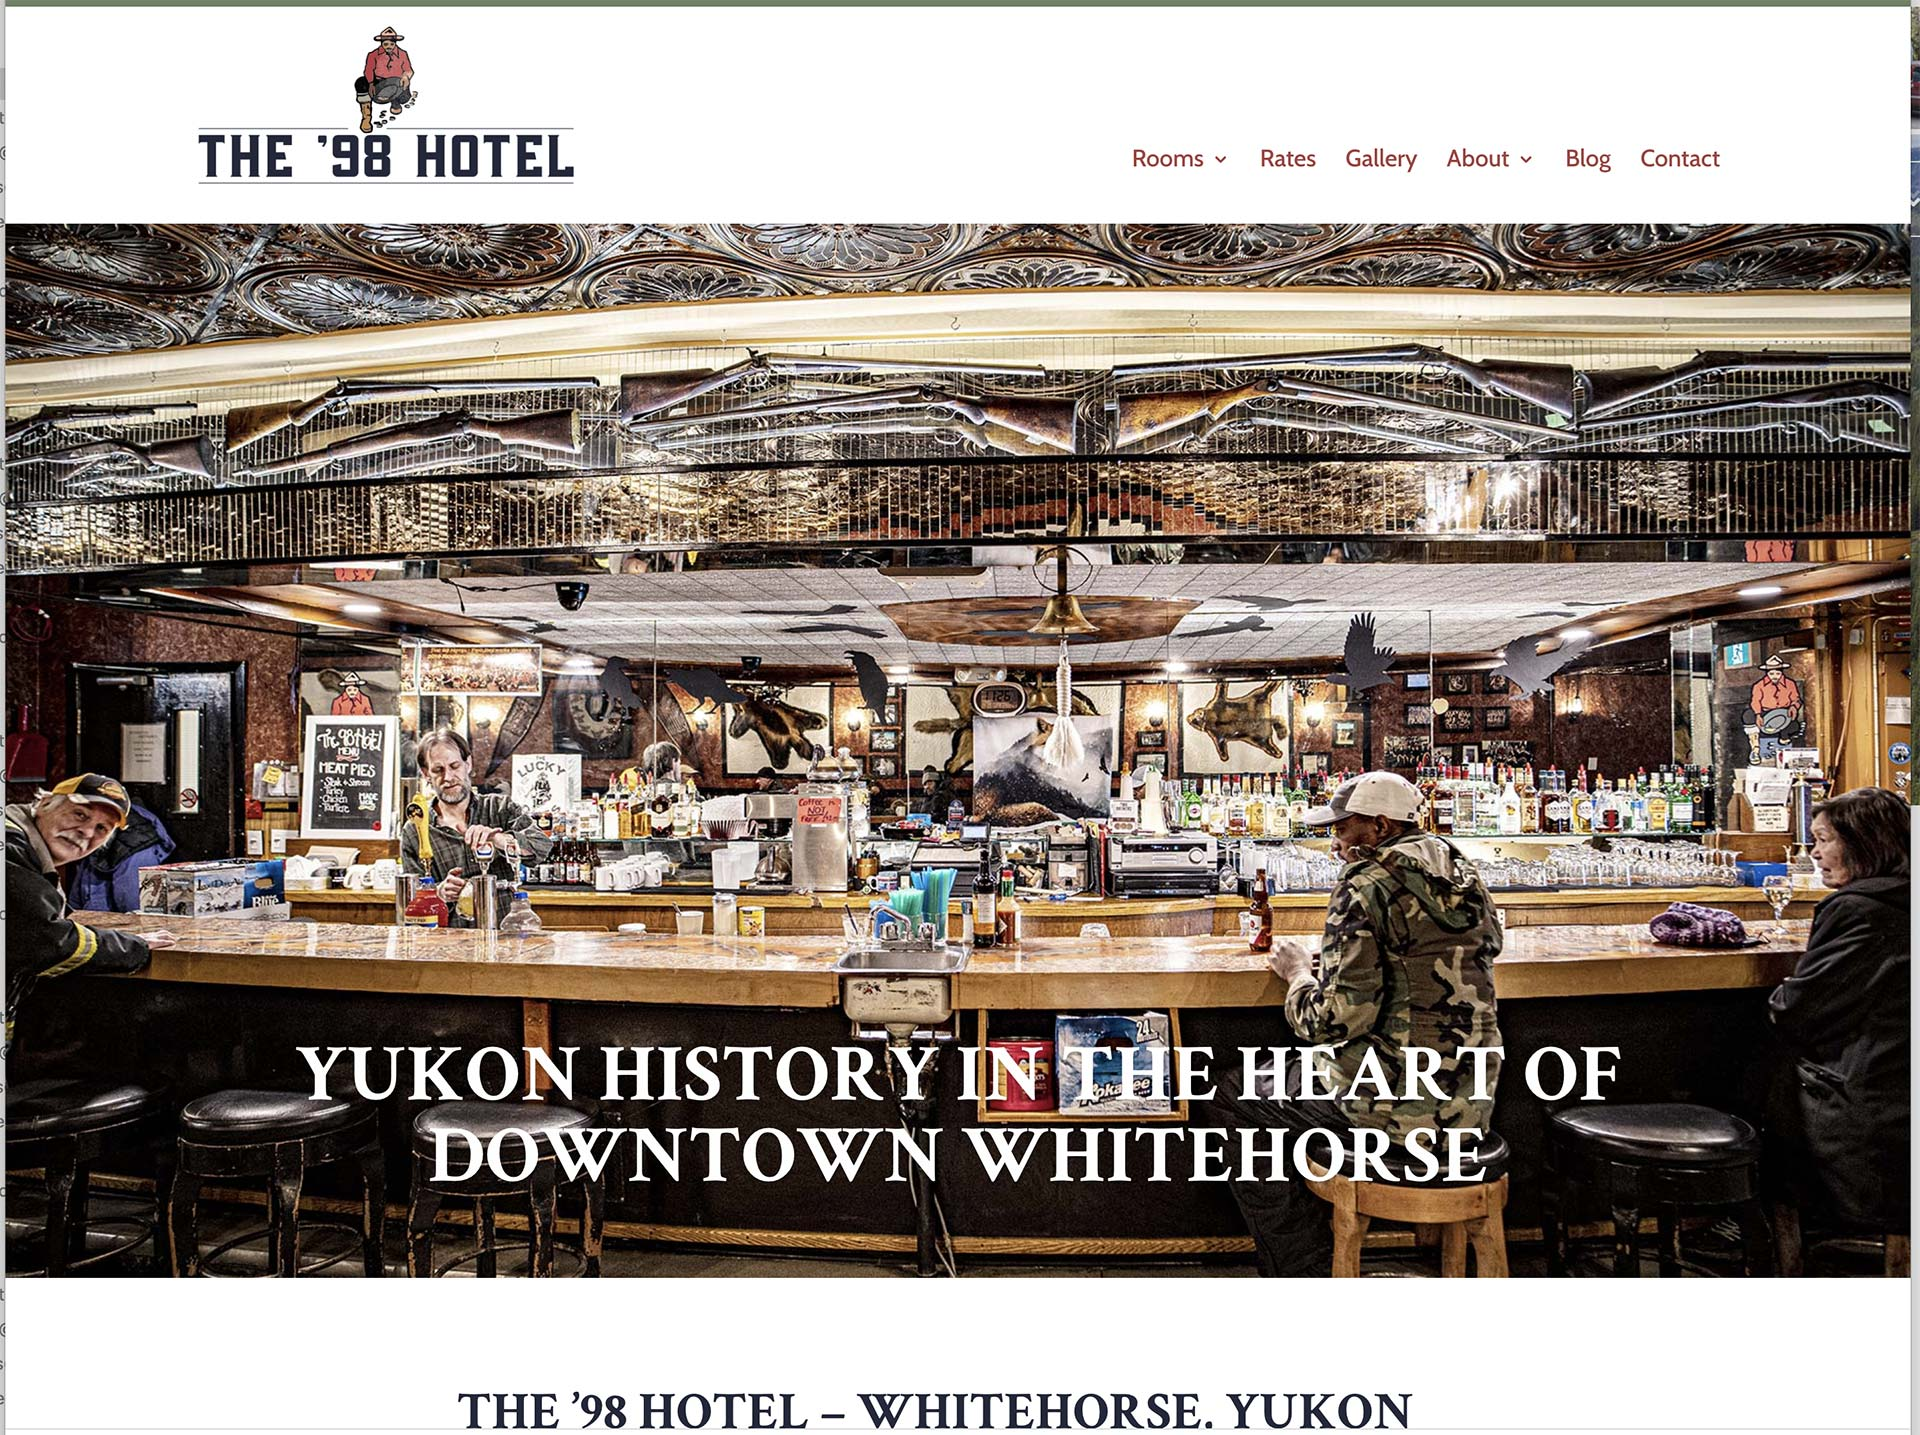 Whitehorse Hotel Web Site